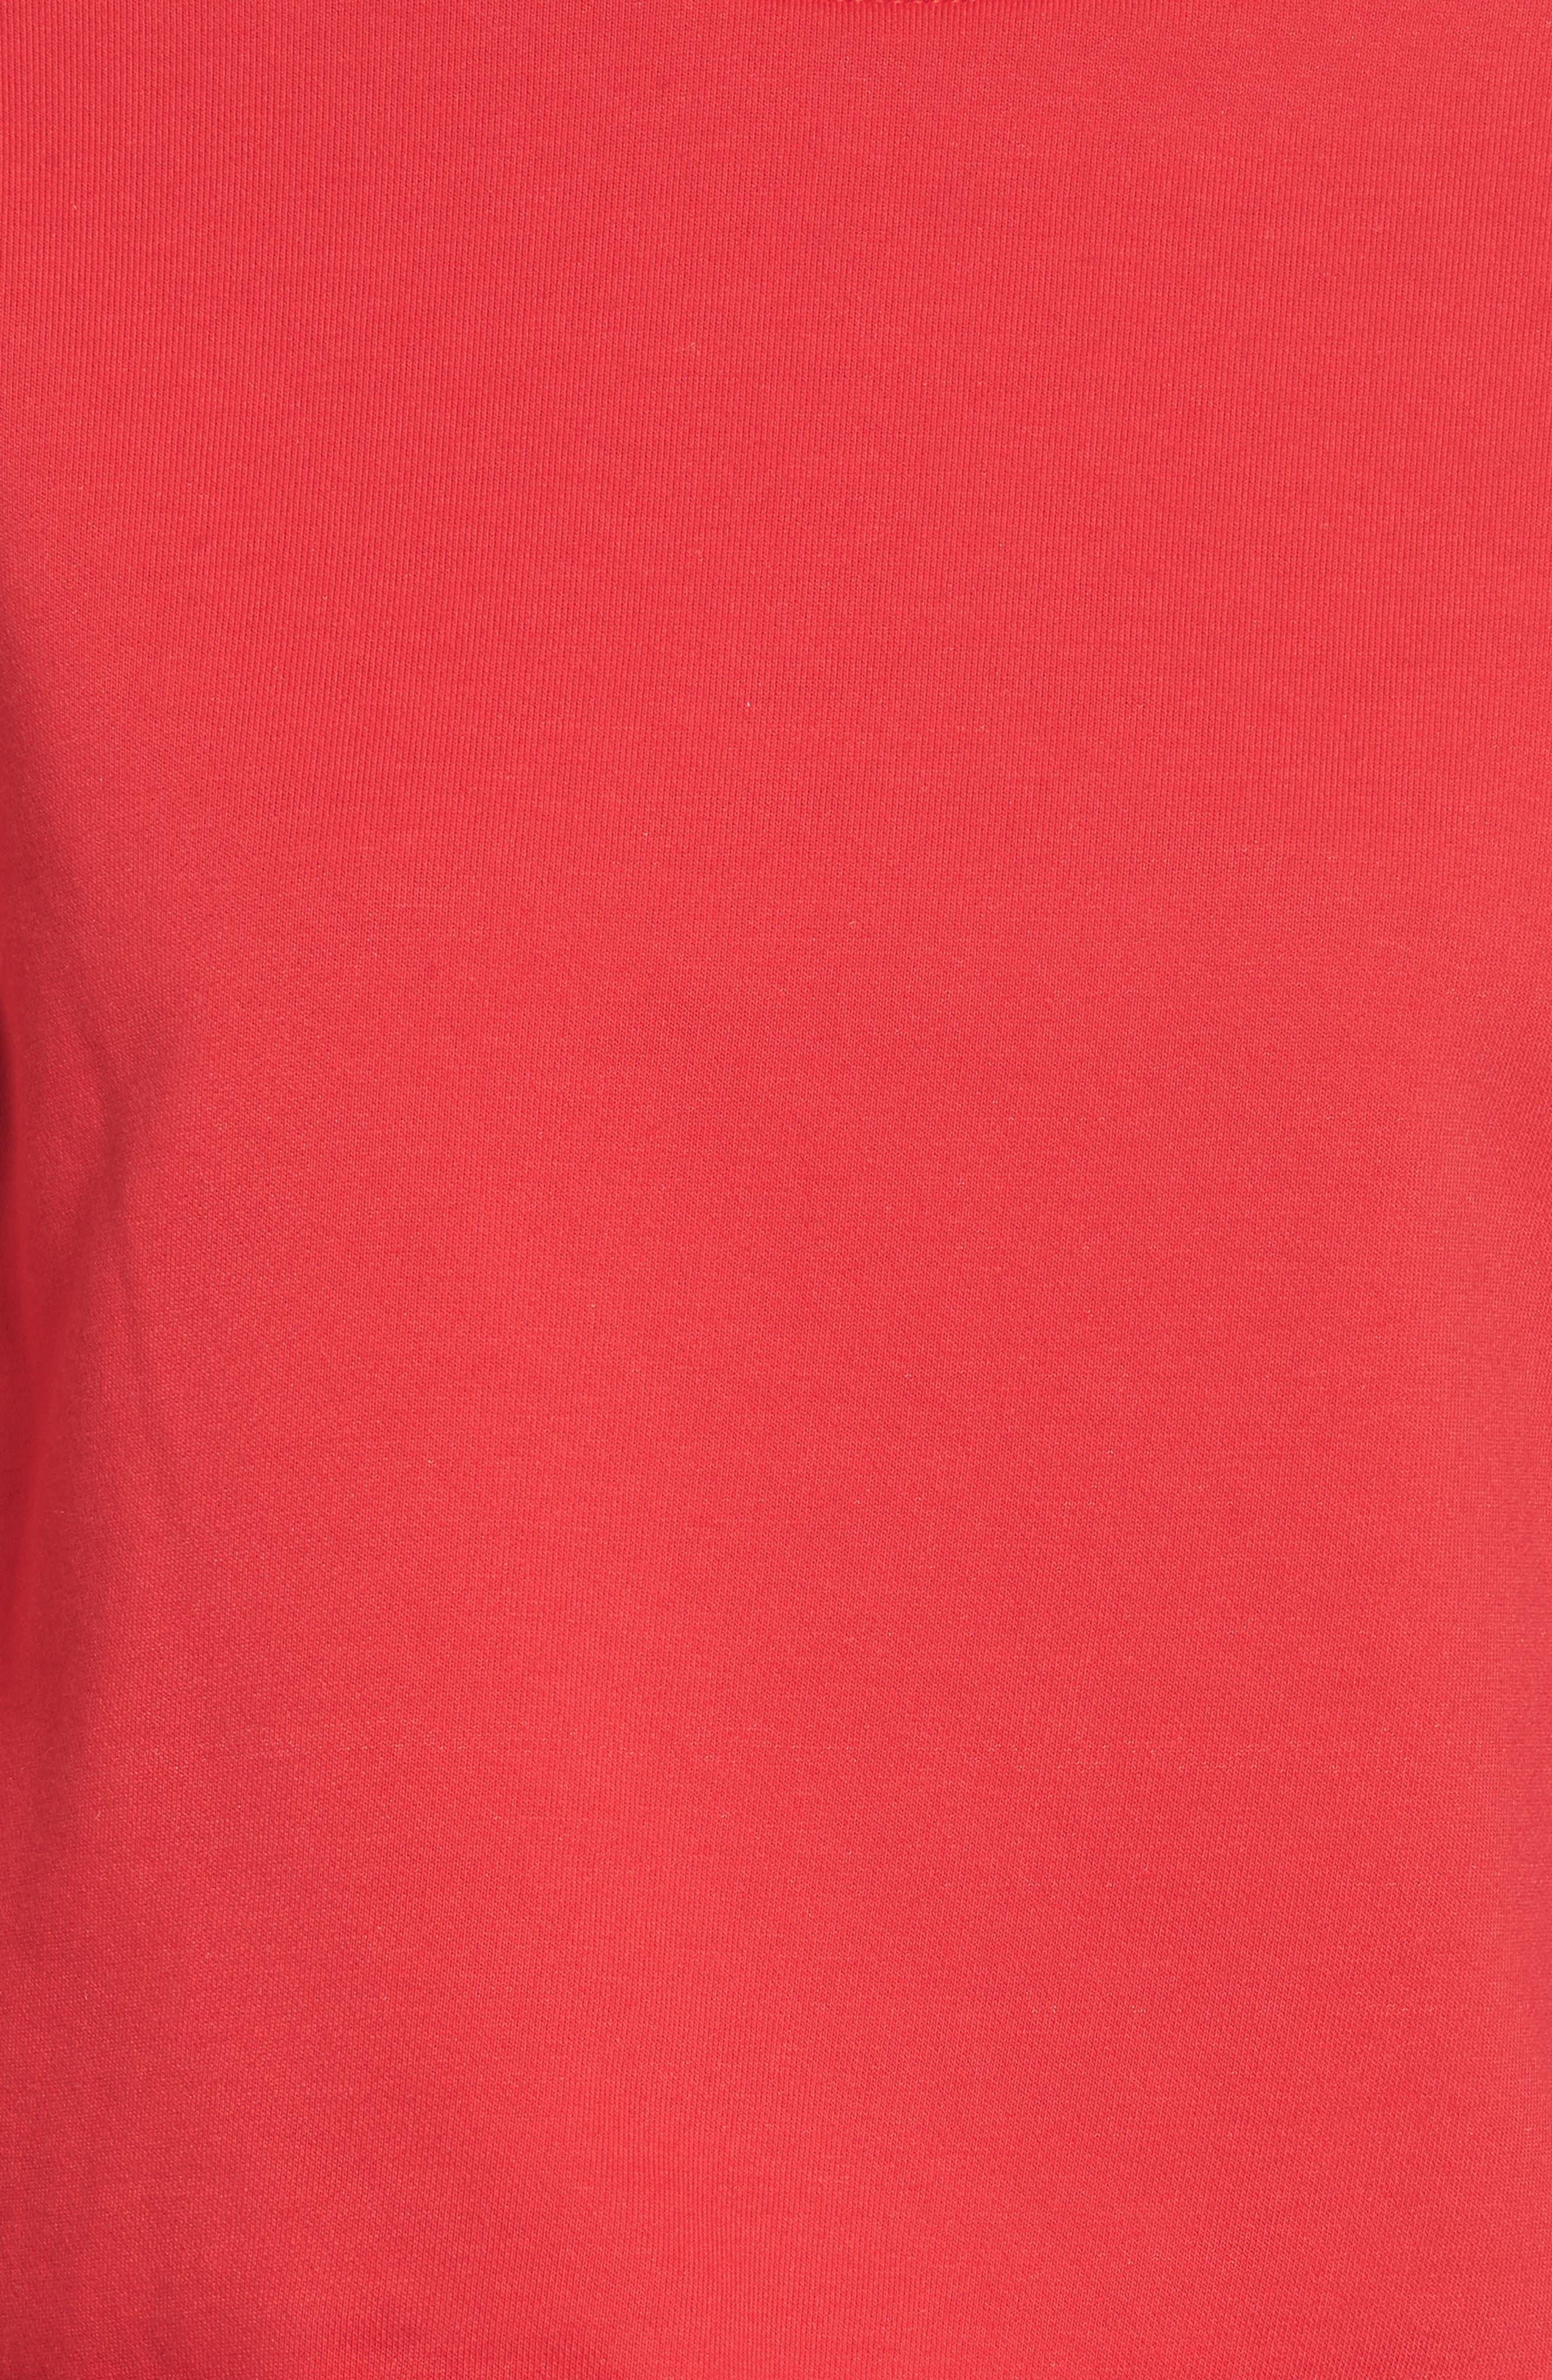 Ruffle Trim Sweatshirt,                             Alternate thumbnail 5, color,                             600